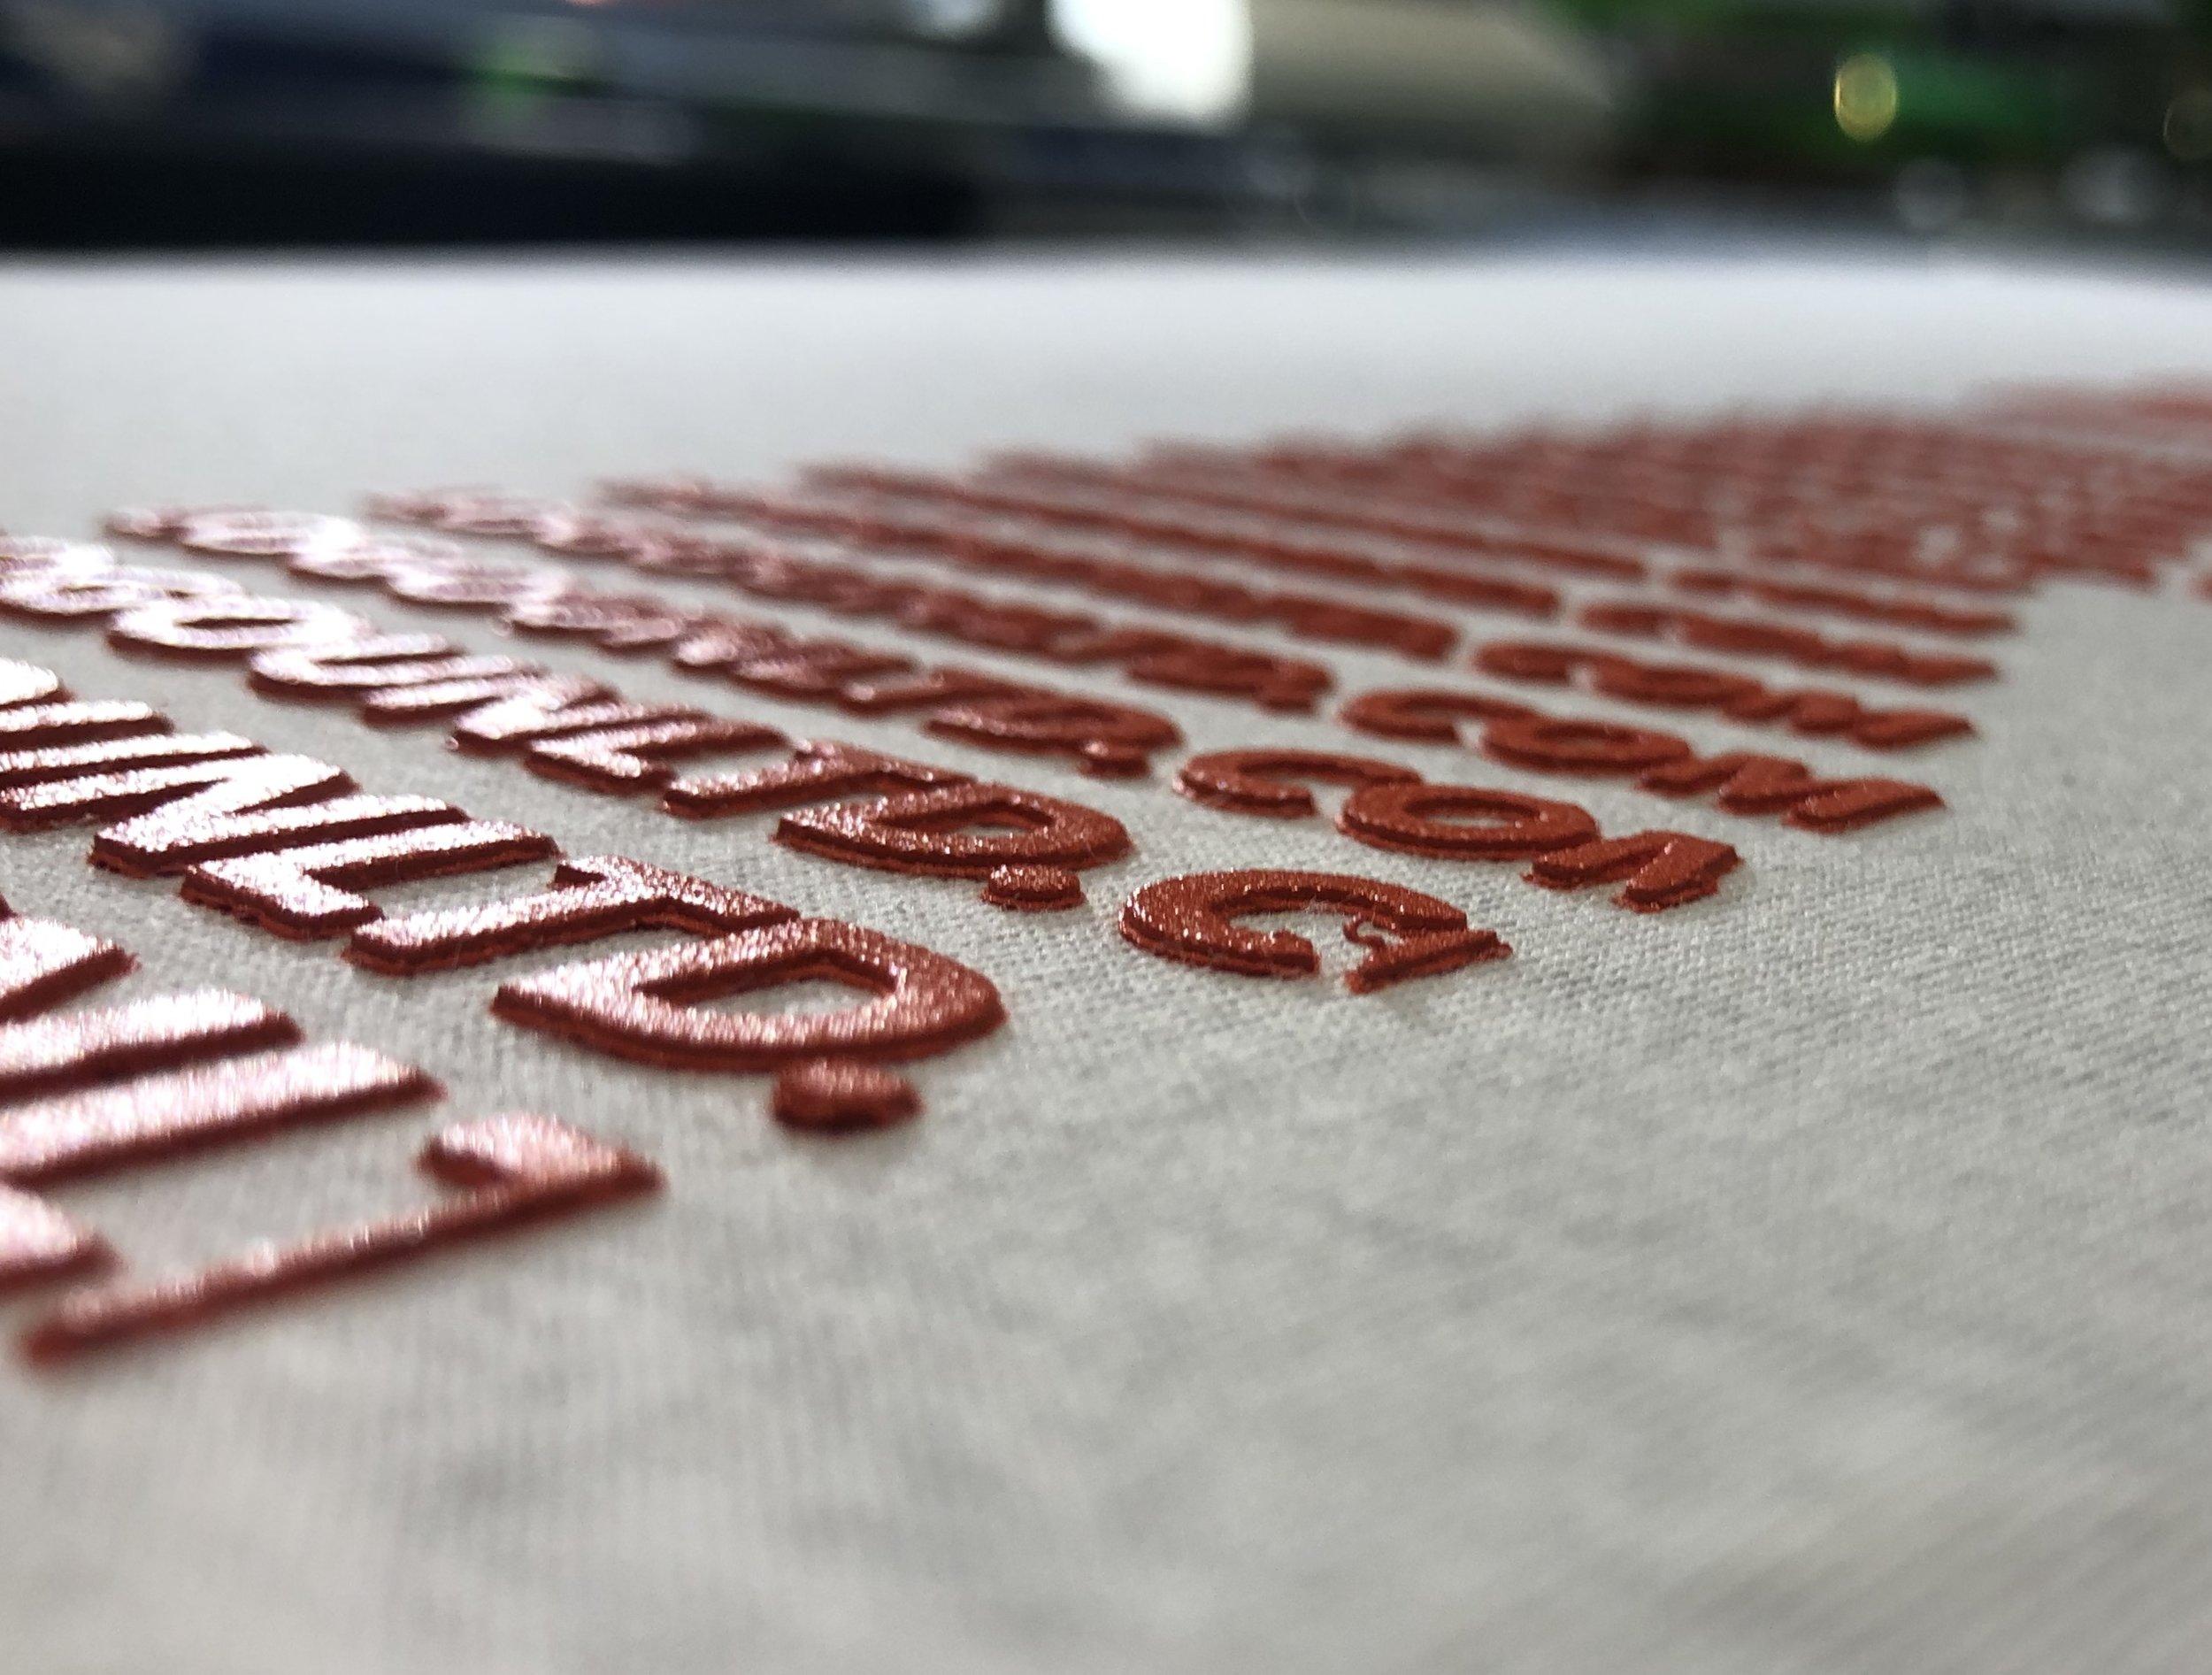 logounltd_laser_etching_embroidery_screen_printing_apparel_uniform_custom_tshirts_kirkland_bellevue_seattle_redmond_woodinville_branded_merchandise_promotional_products_logo_unltd_specialty_inks_HD_gel_raised (5).jpg